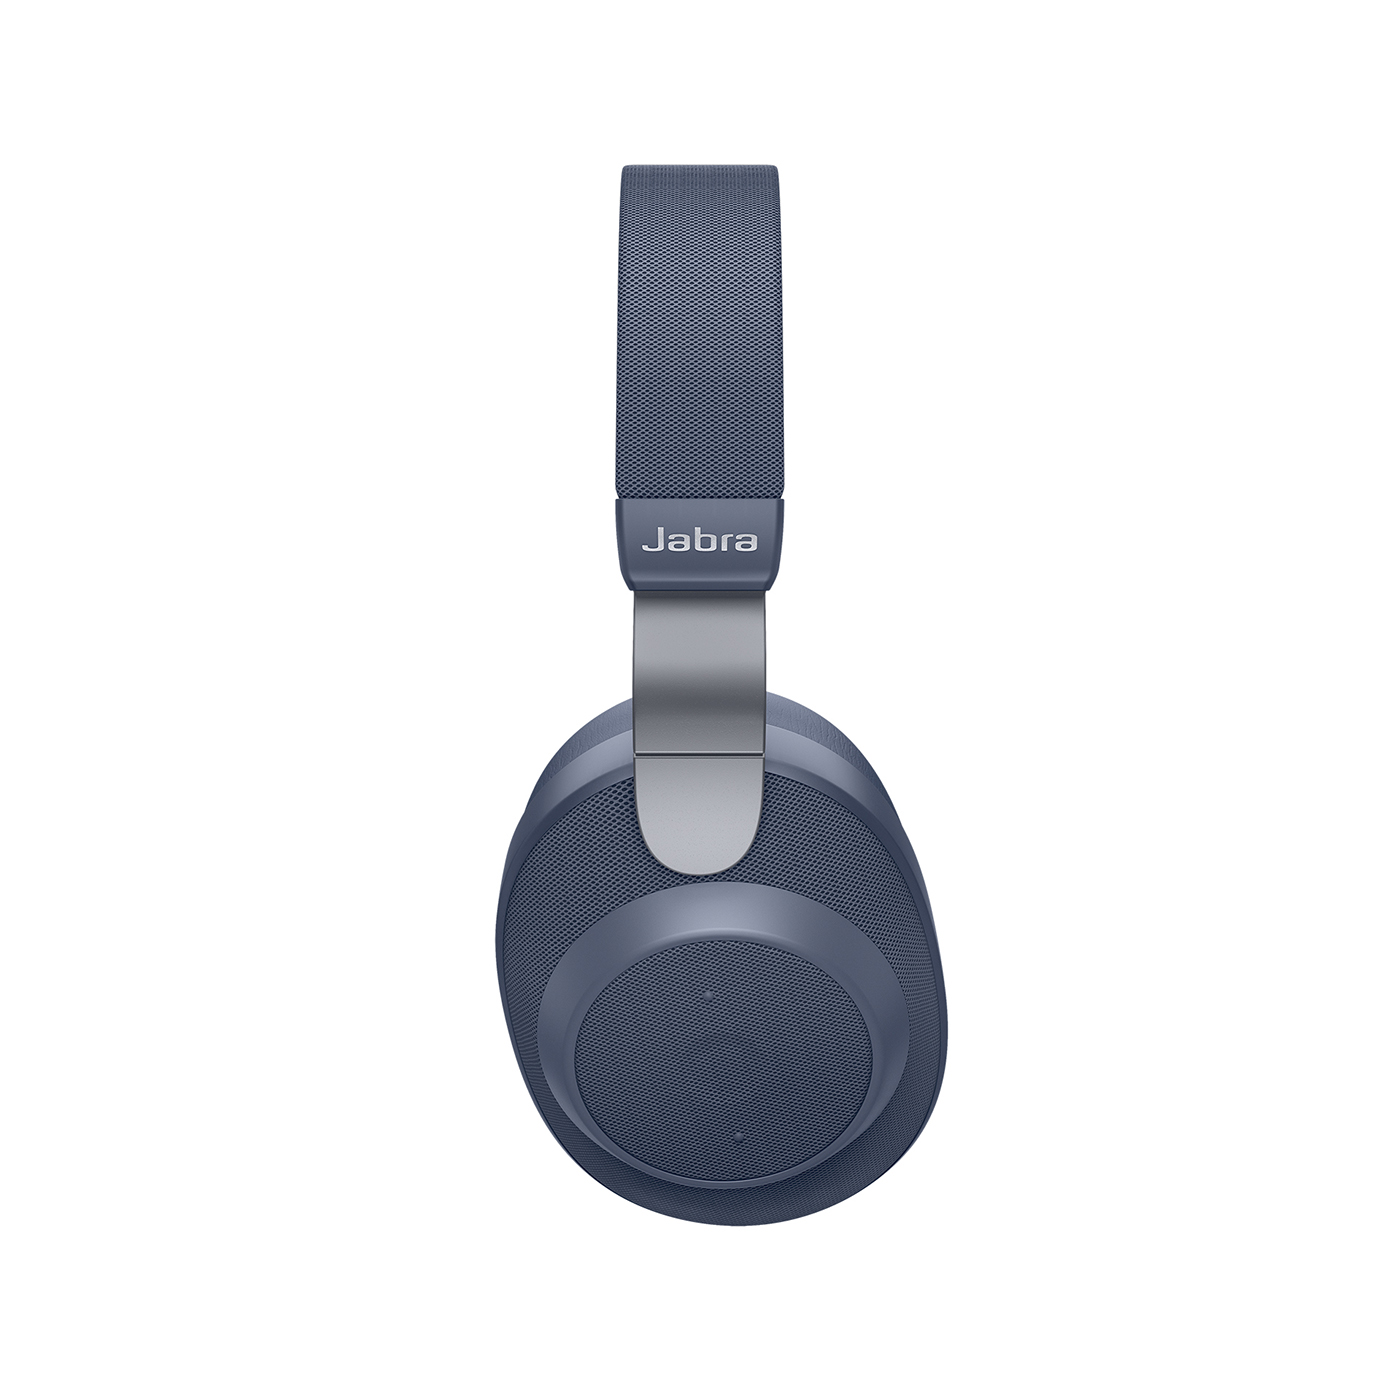 Jabra-Elite-85h-Wireless-Stereo-ANC-Headphones thumbnail 16